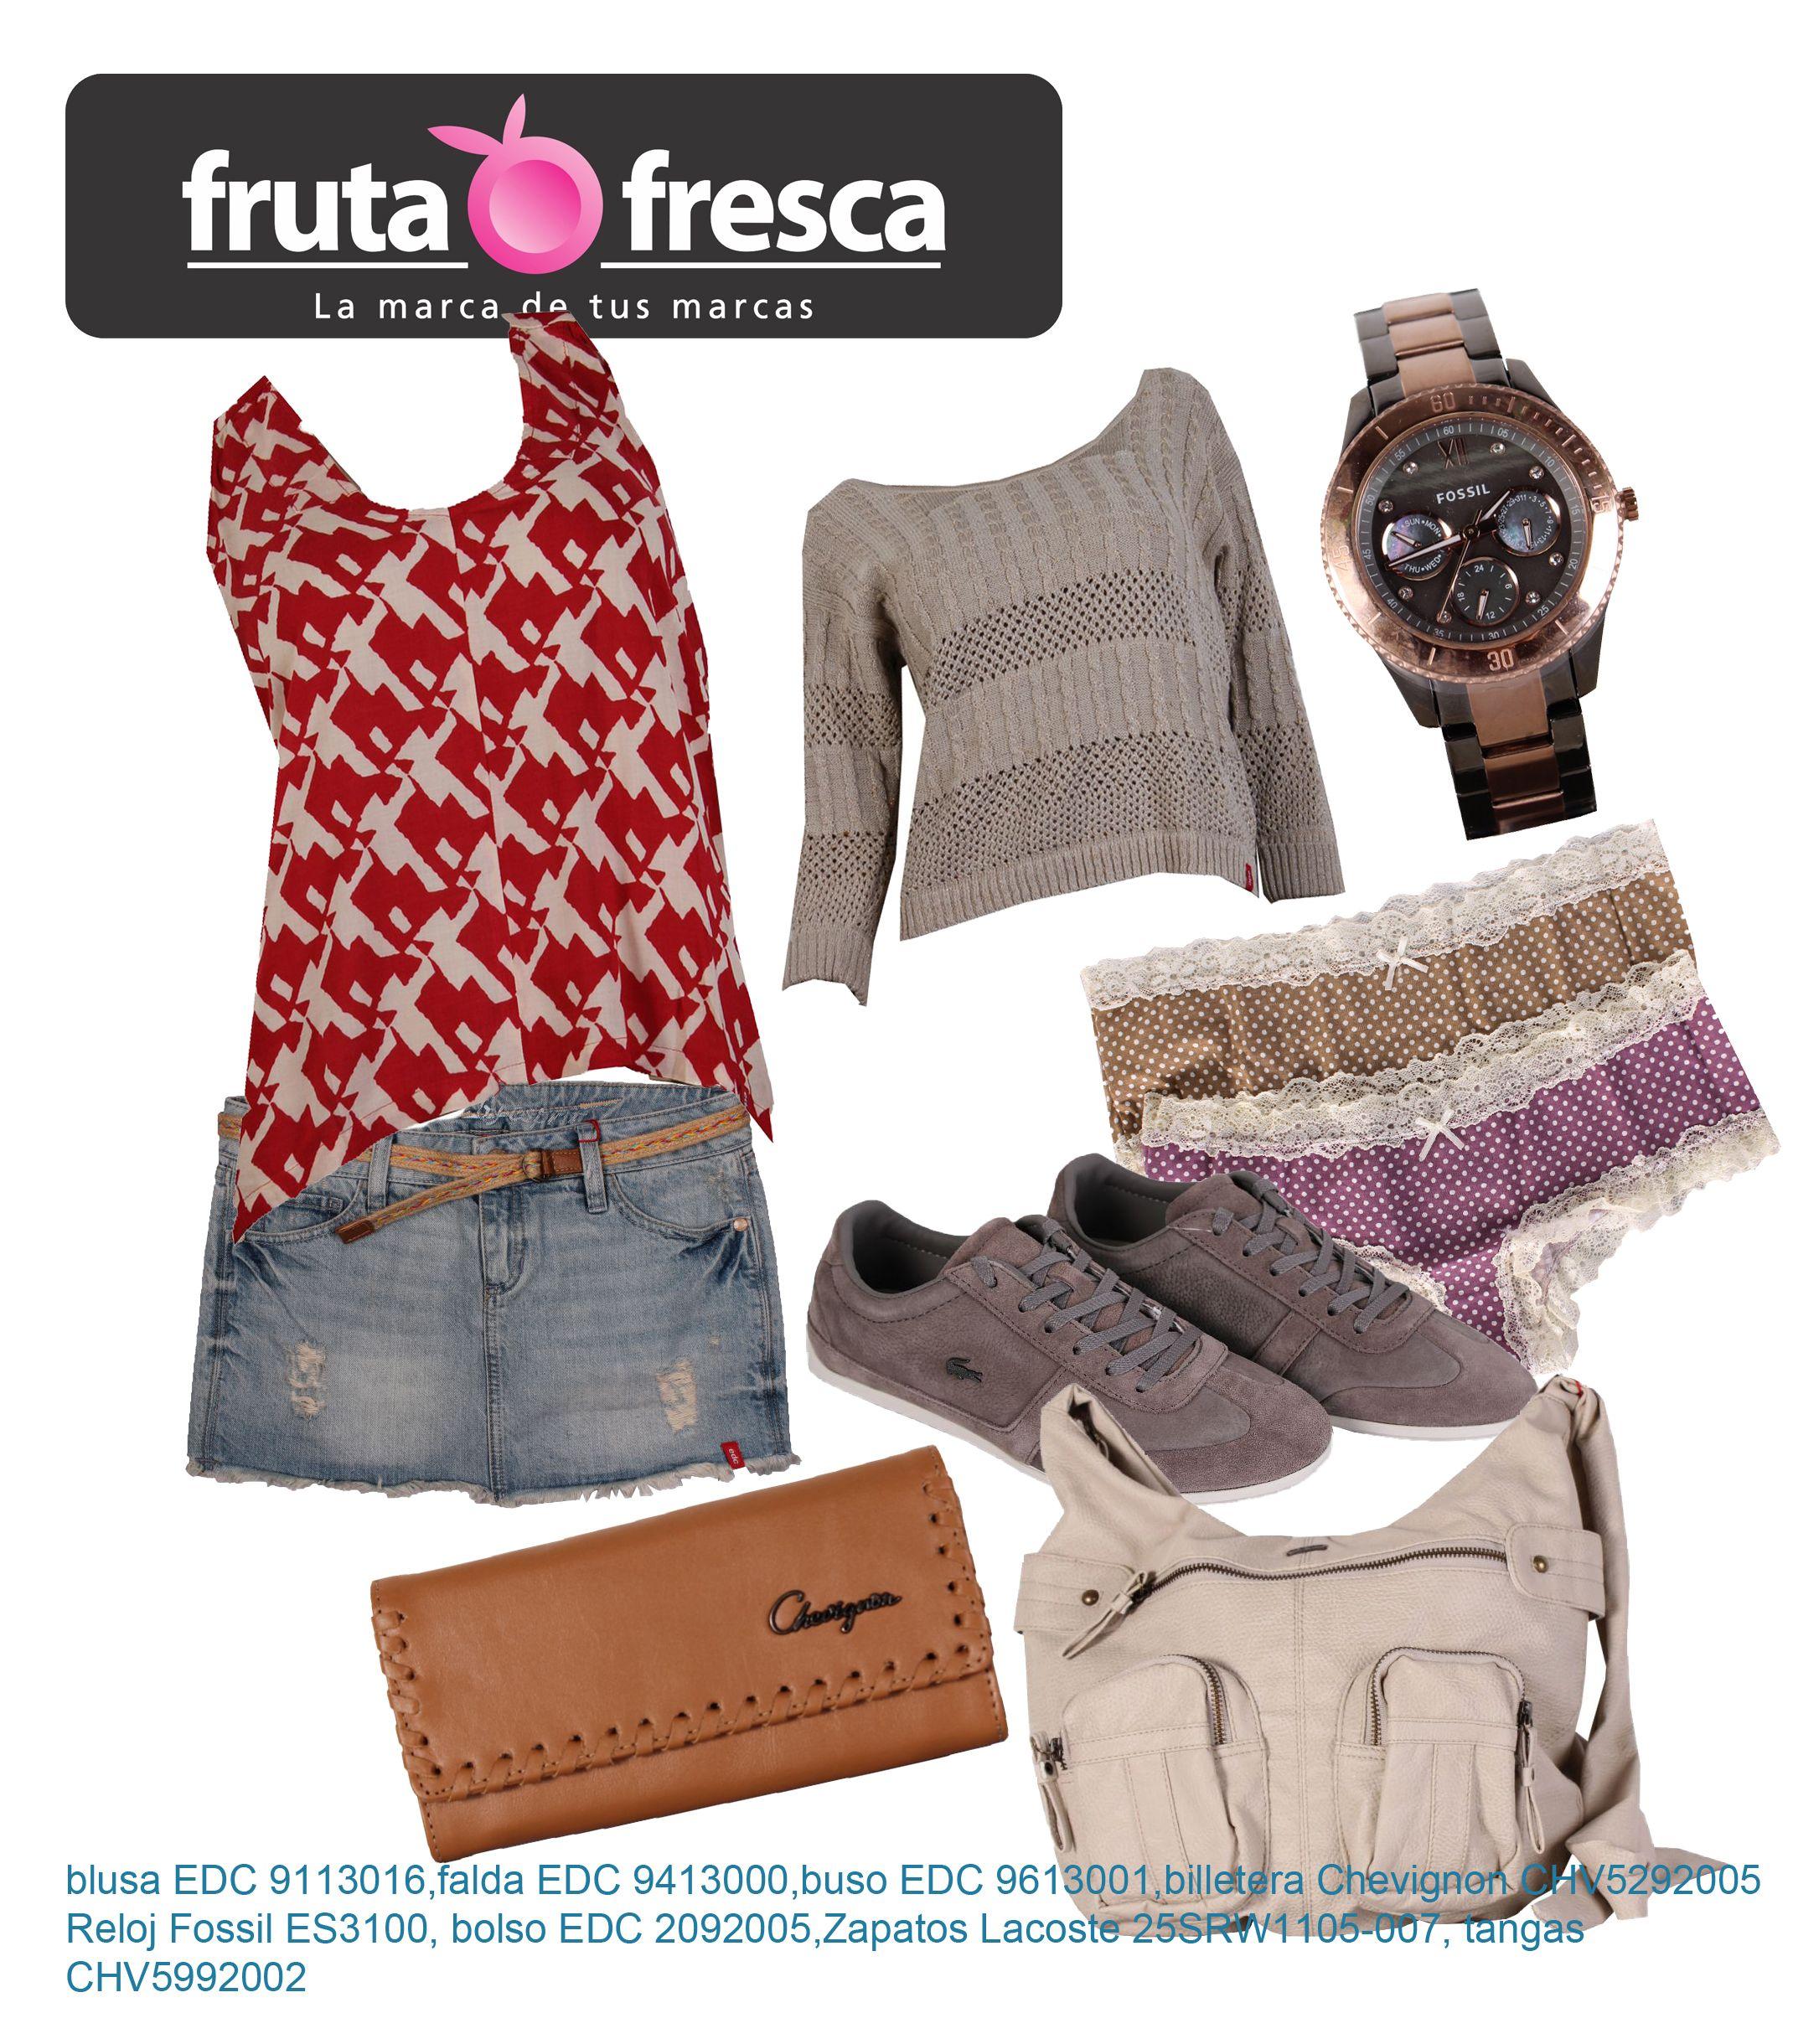 Fruta Fresca (frutafrescacol) on Pinterest 6106fd3fcd7d